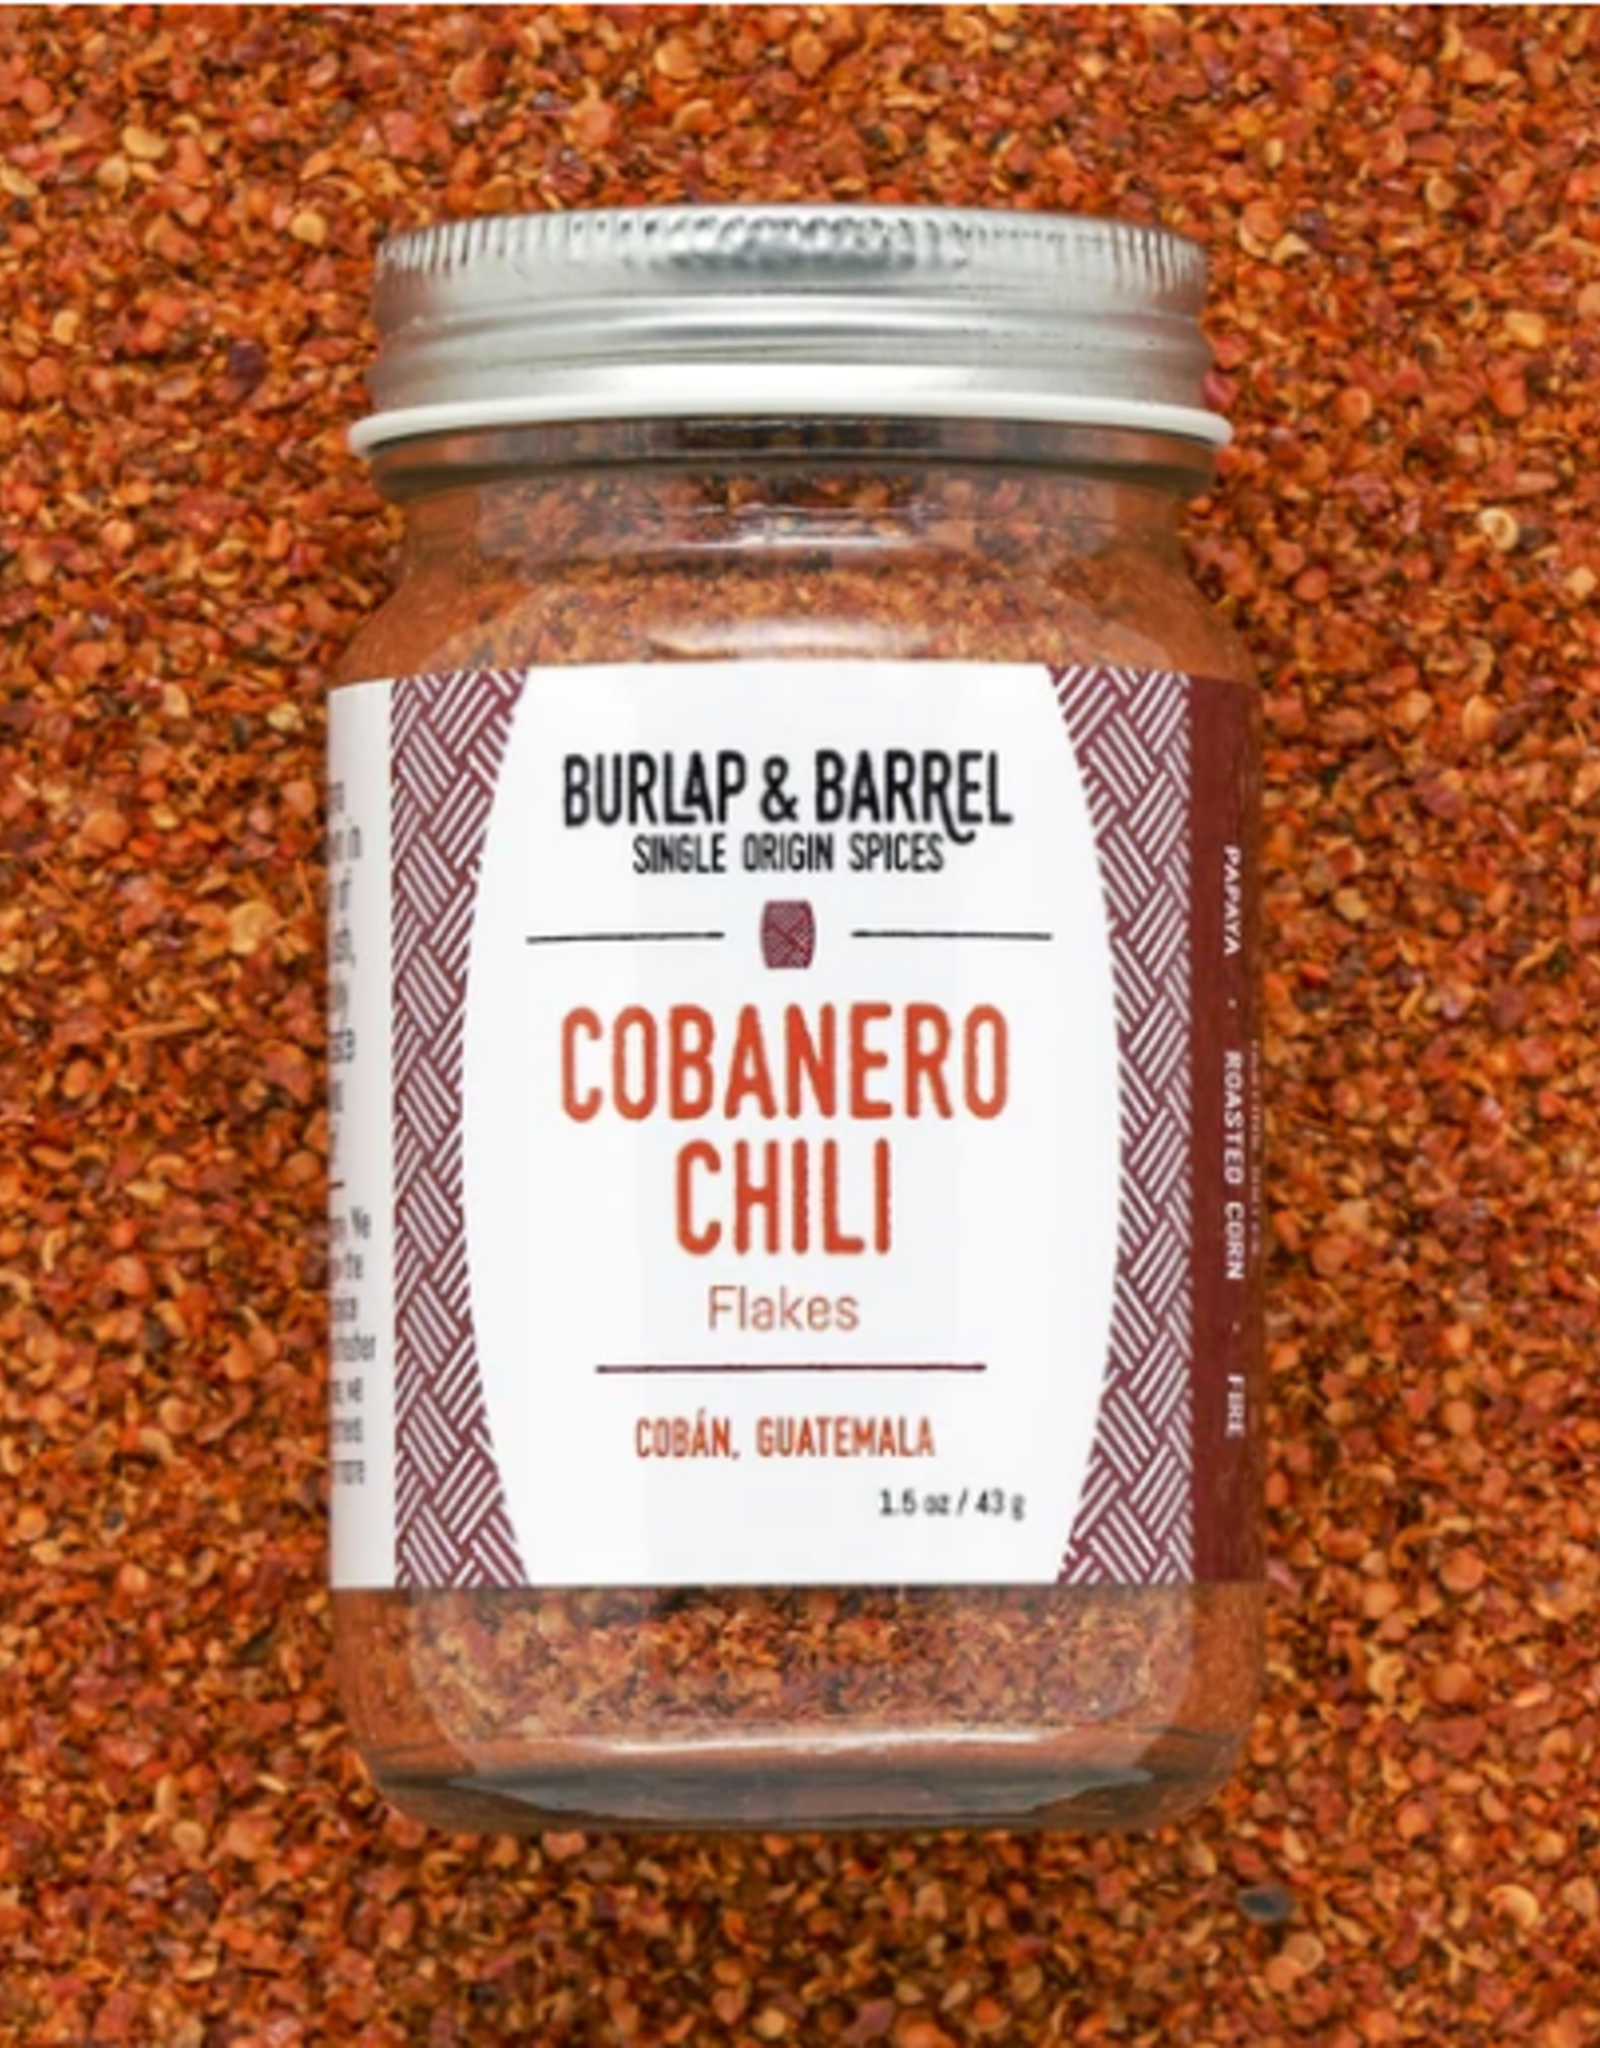 Burlap & Barrel Cobanero Chili Flakes